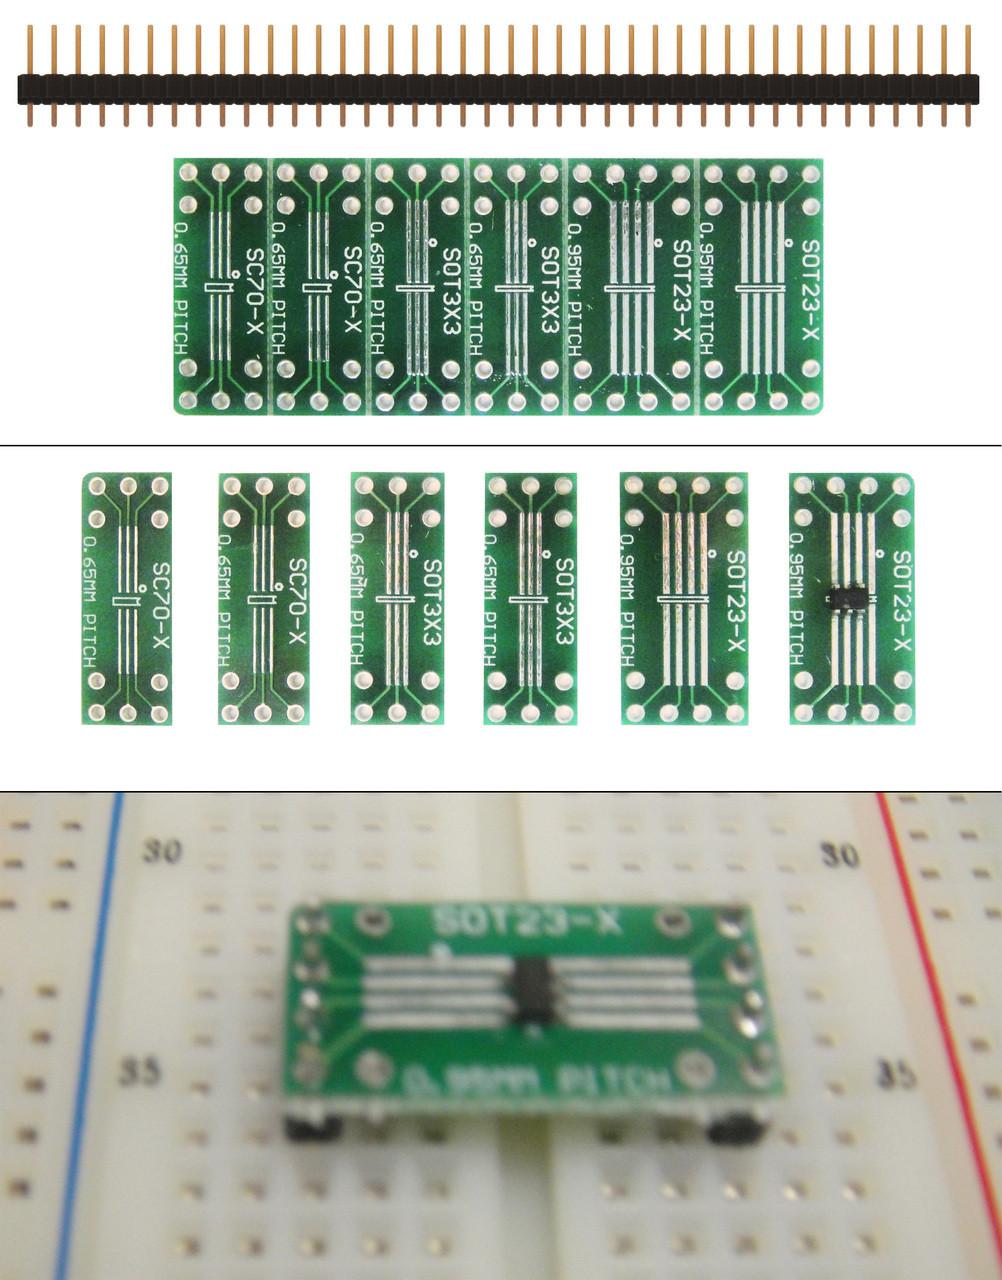 SOT23 Test Adaptor PEAK PCA23 SOT 23 SOT-23 Component Adaptor JPSS127